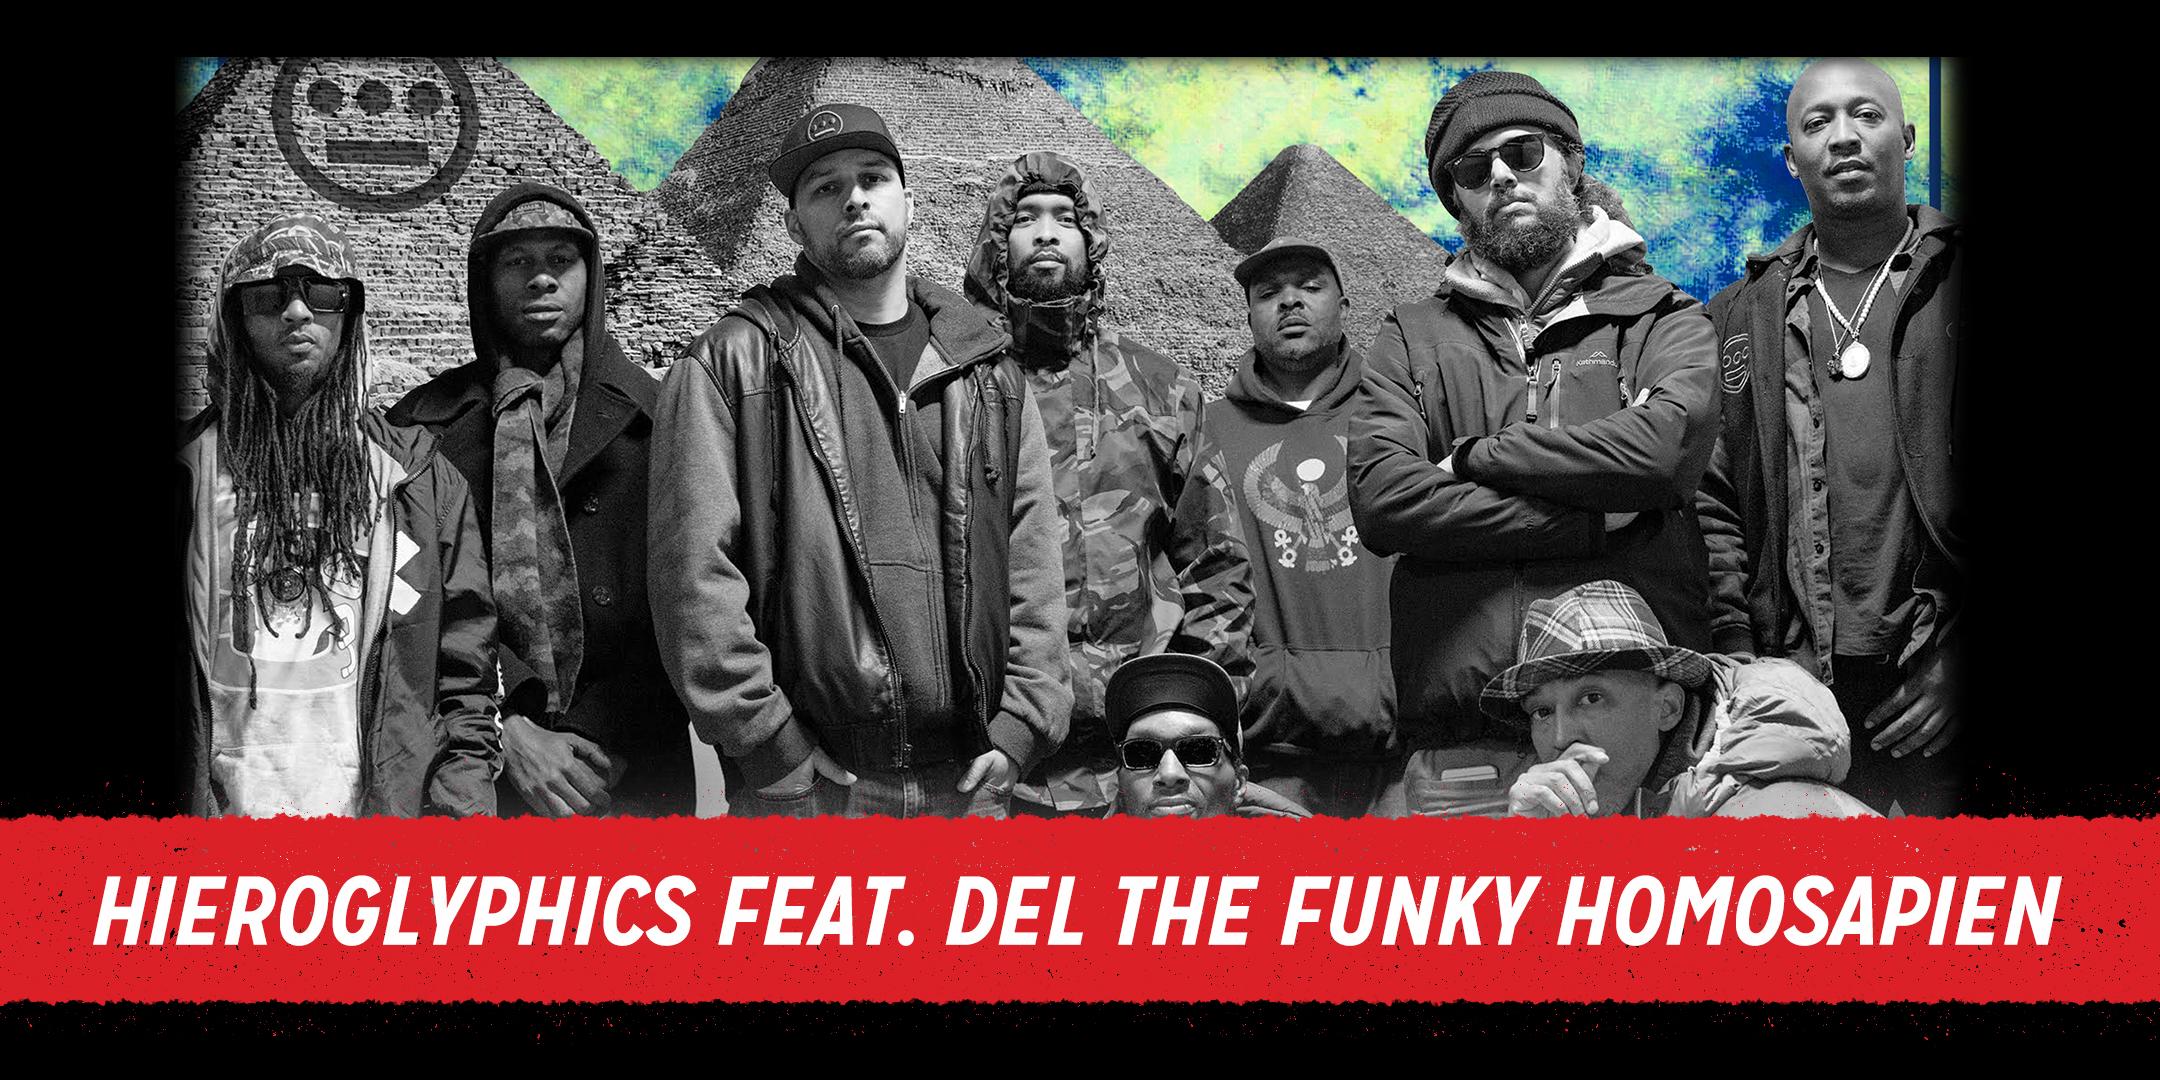 Hieroglyphics-feat.-Del-the-Funky-HomosapienBanners.jpg